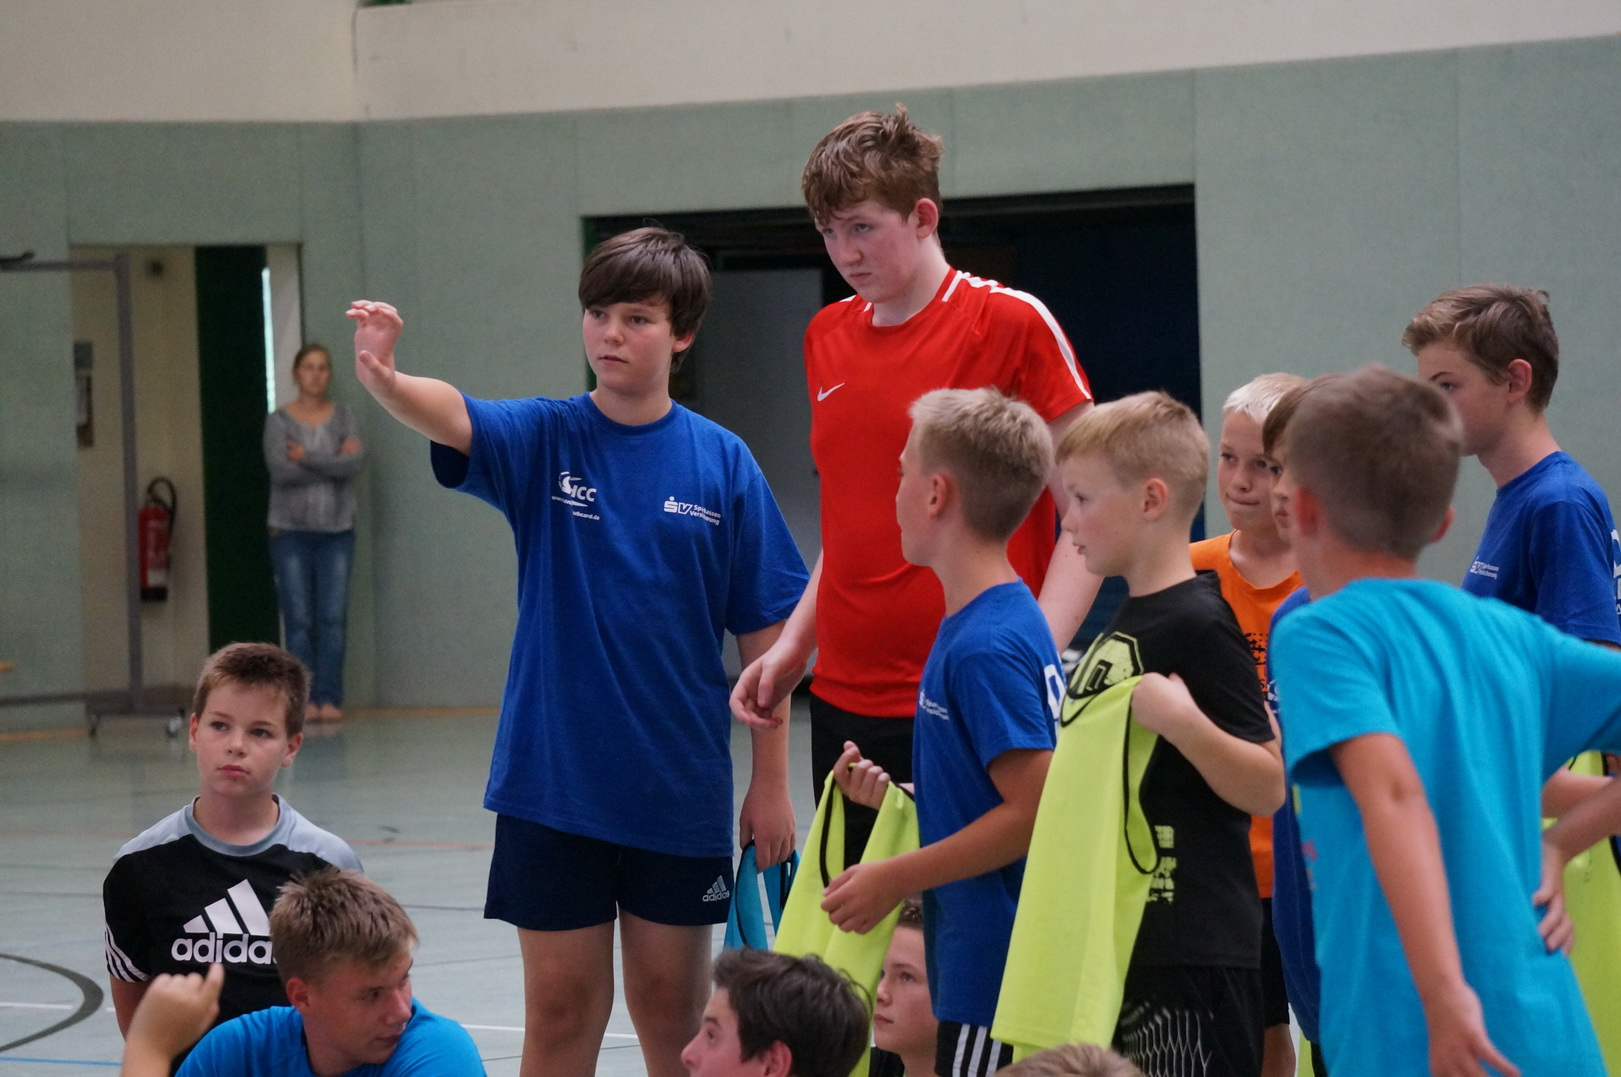 201808_Handballcamp_SDH_MG_132w